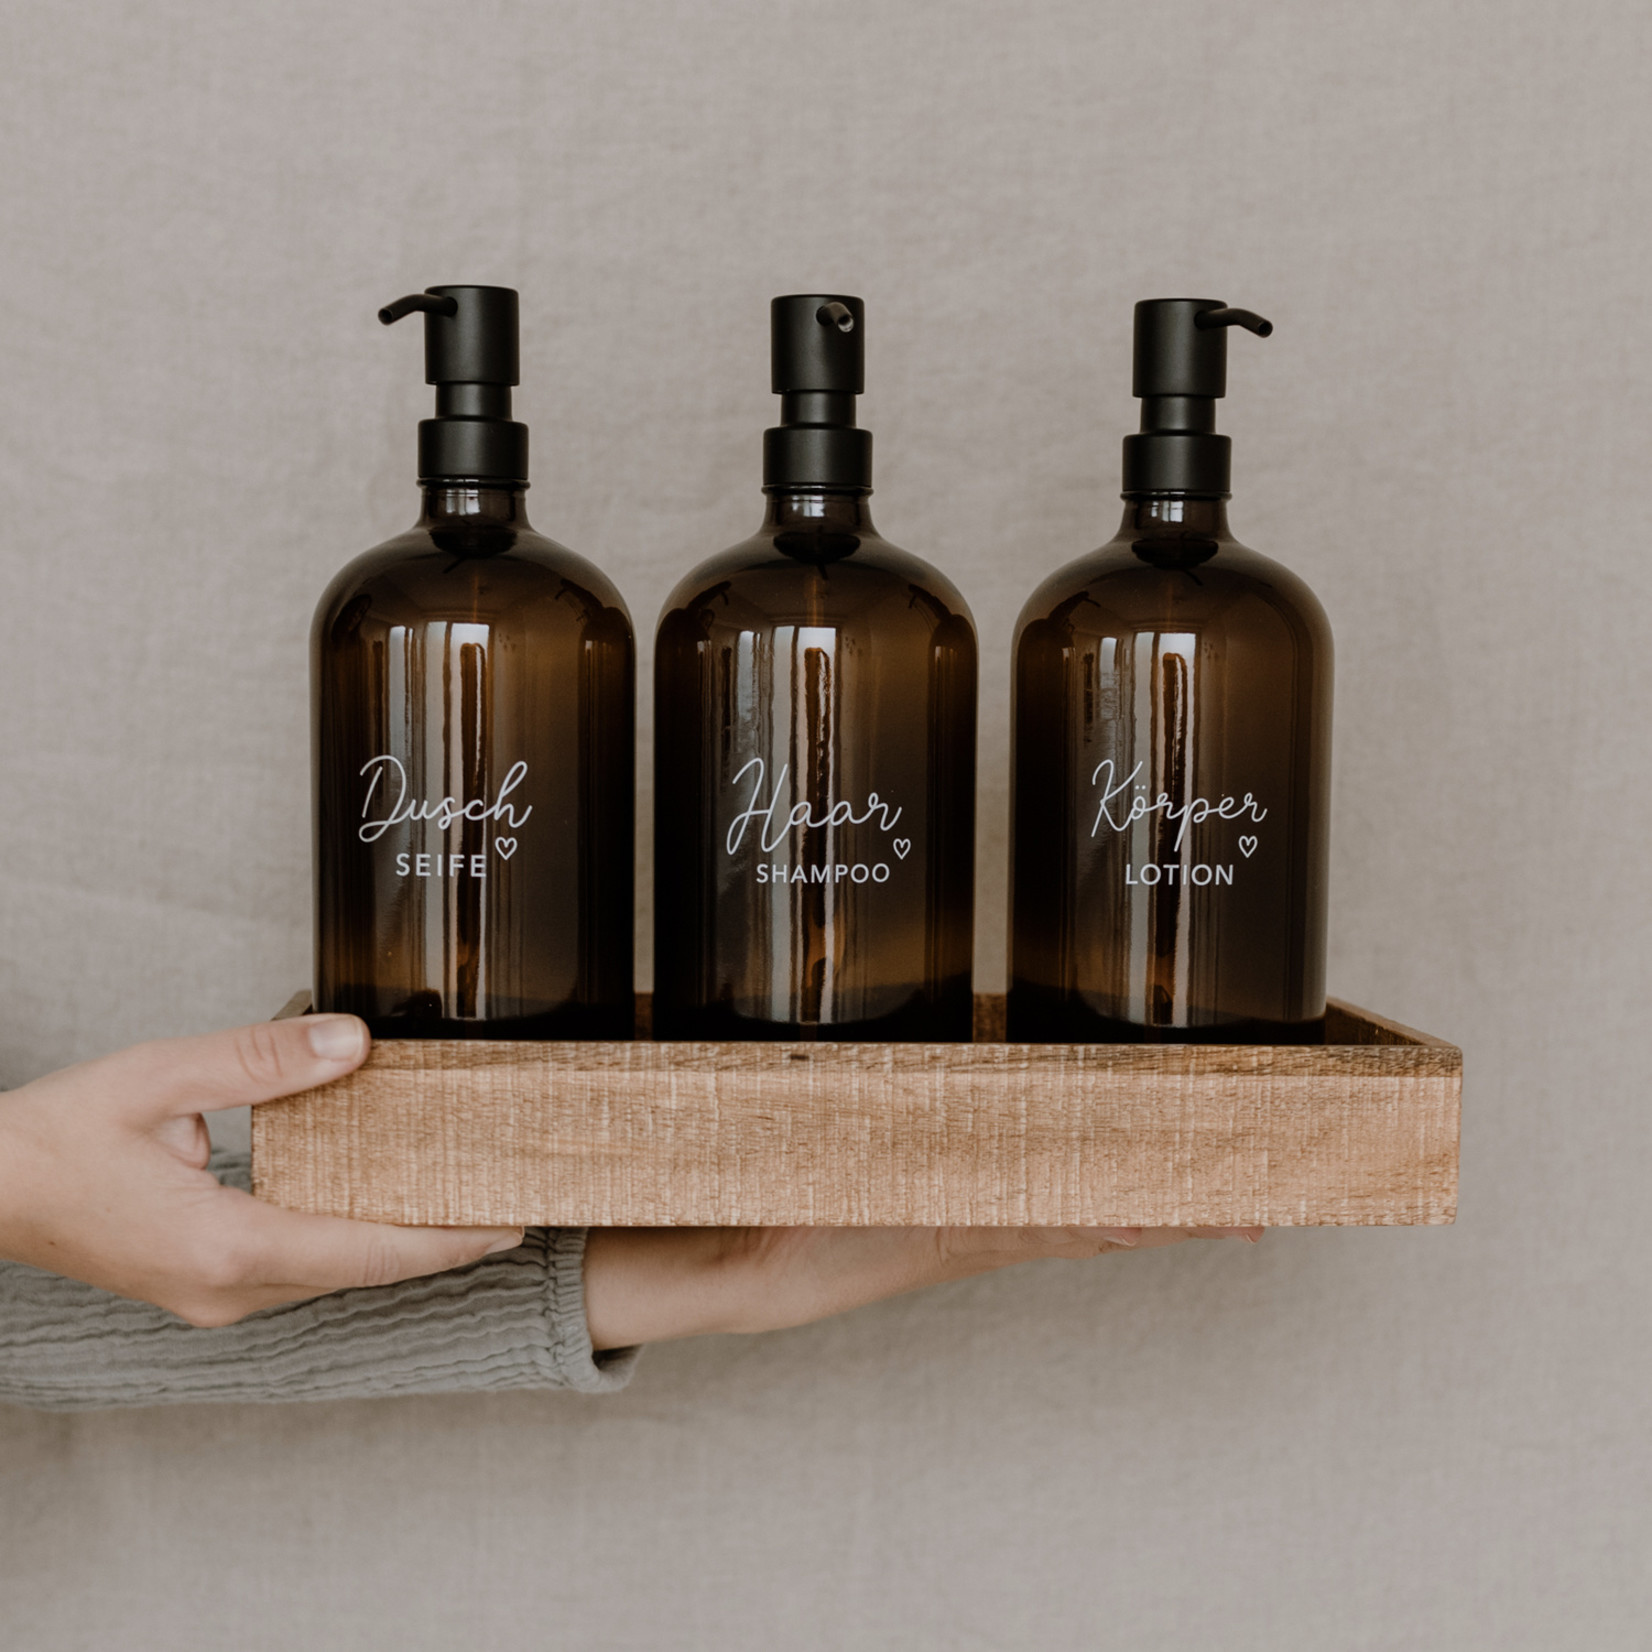 Eulenschnitt Seifenspender Haarshampoo